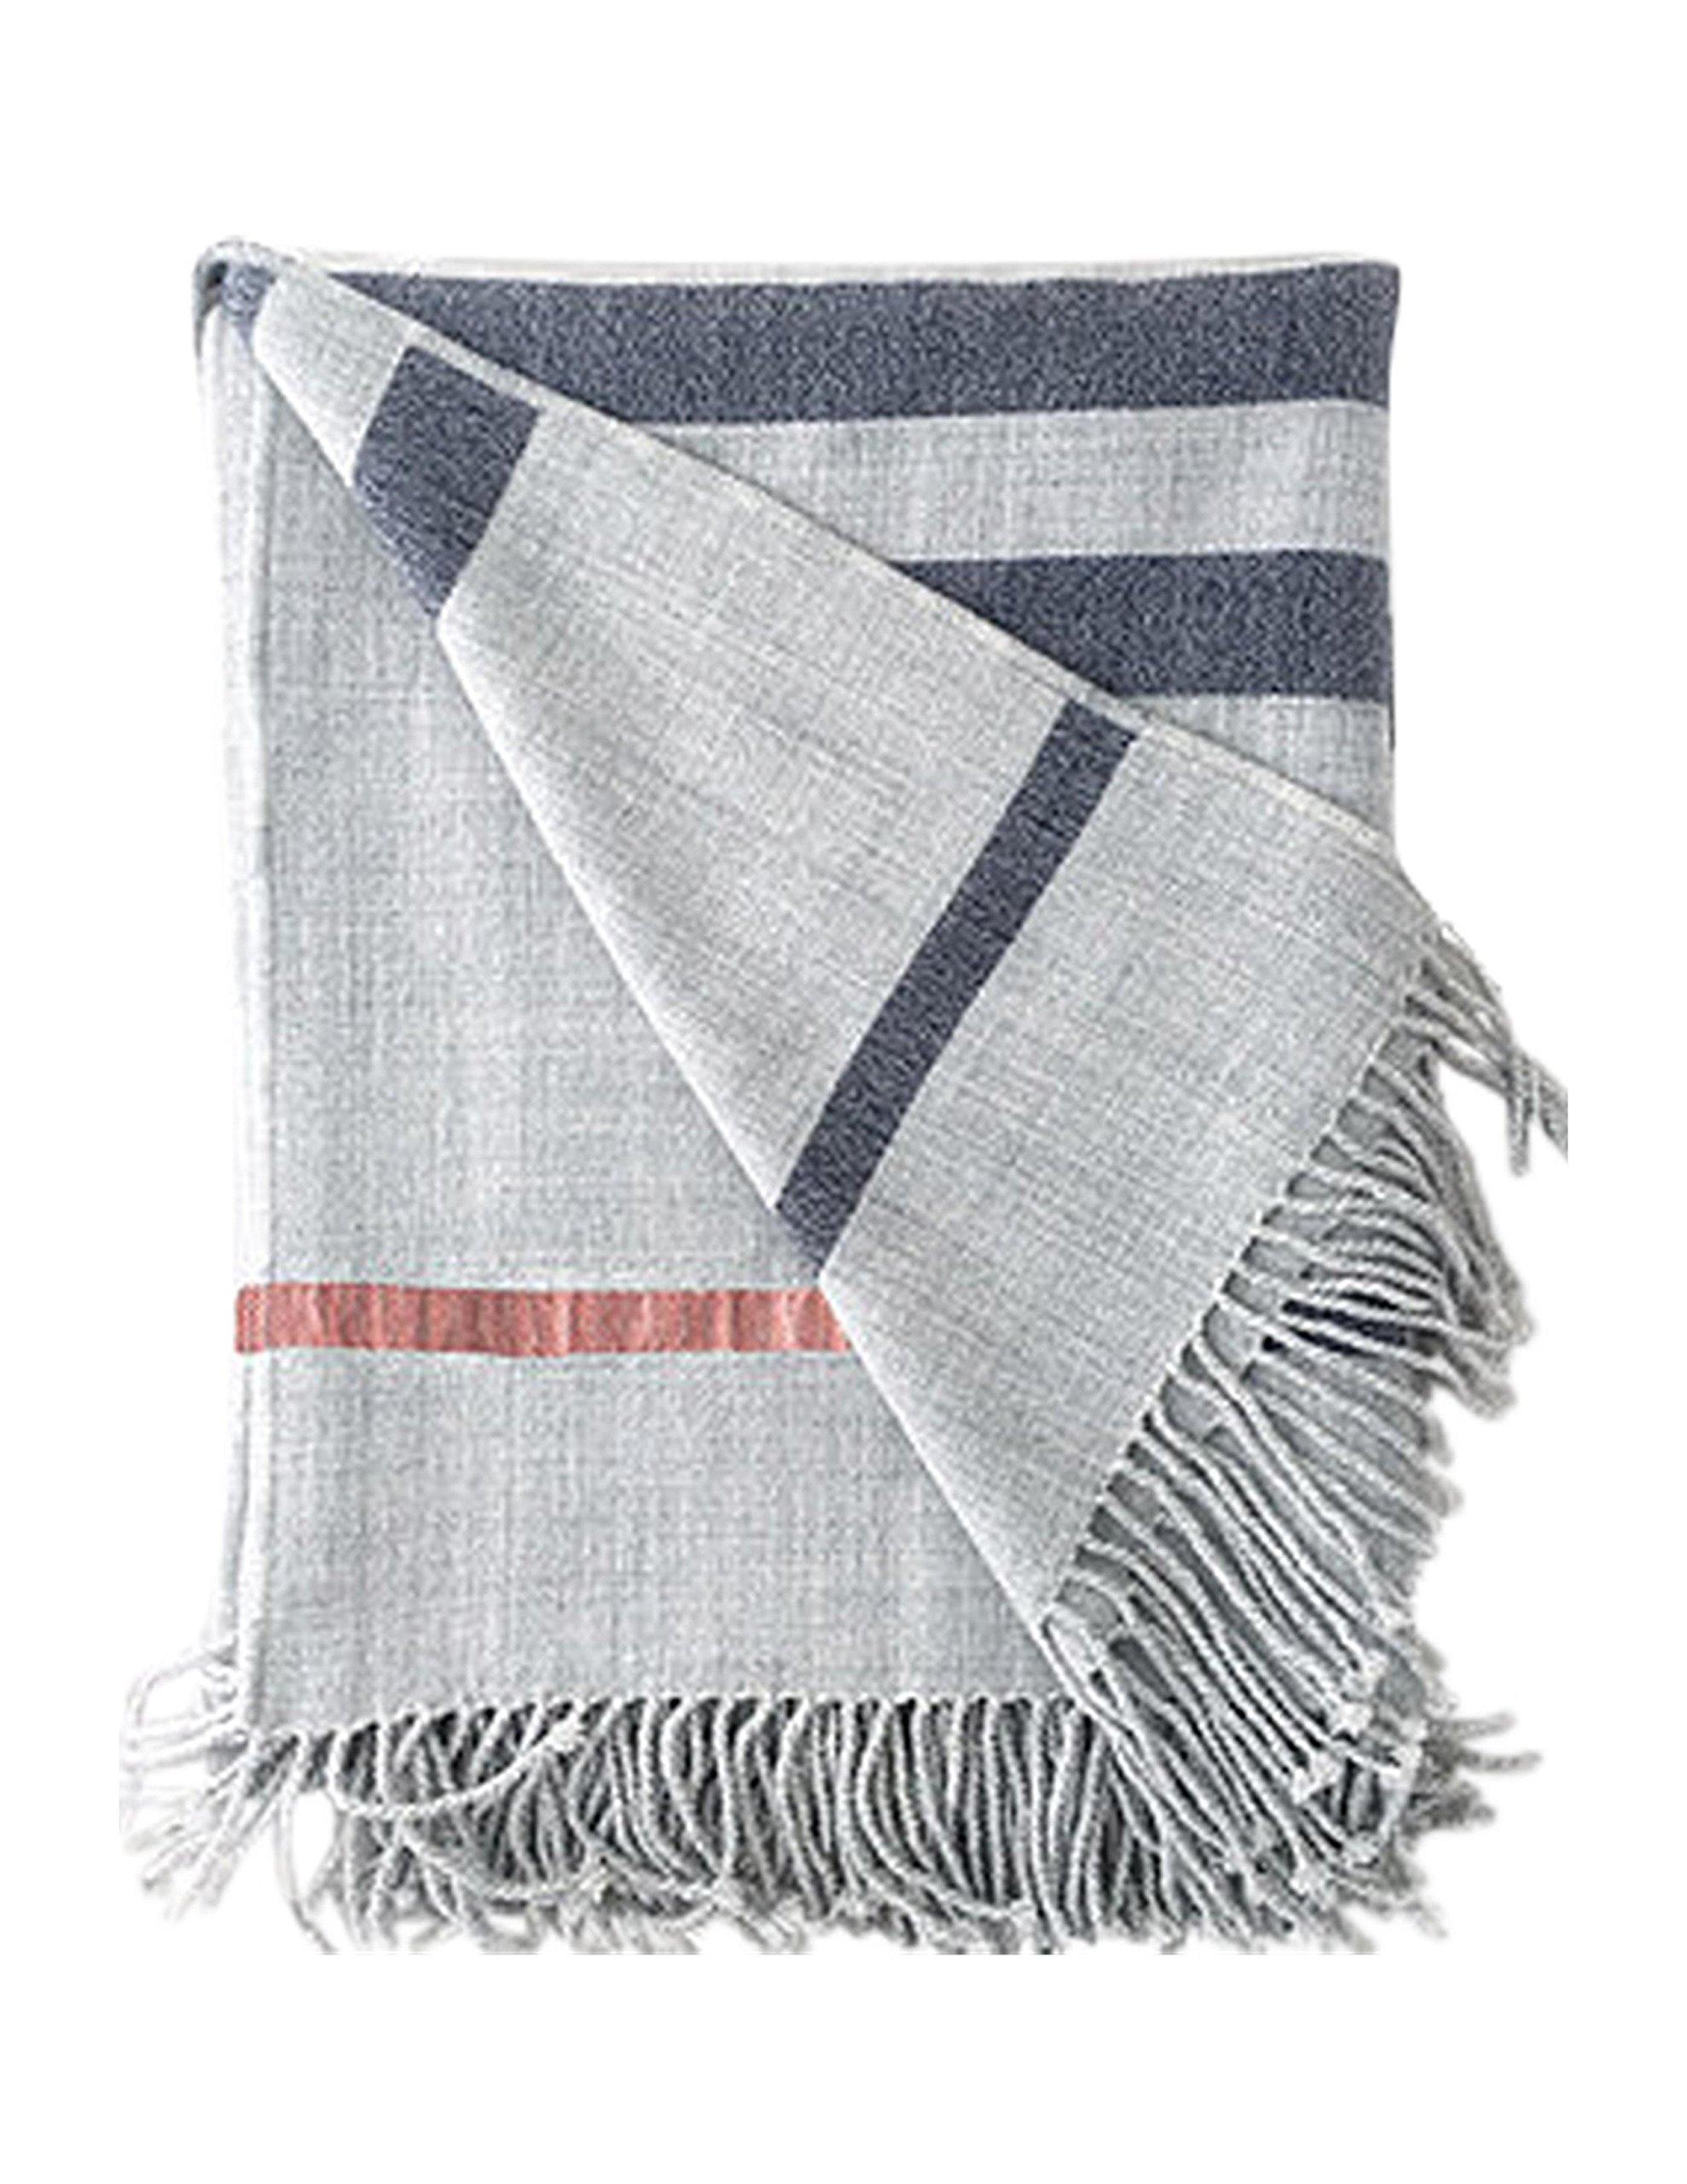 Travel Wrap Fog Grey Stripes (with pockets)